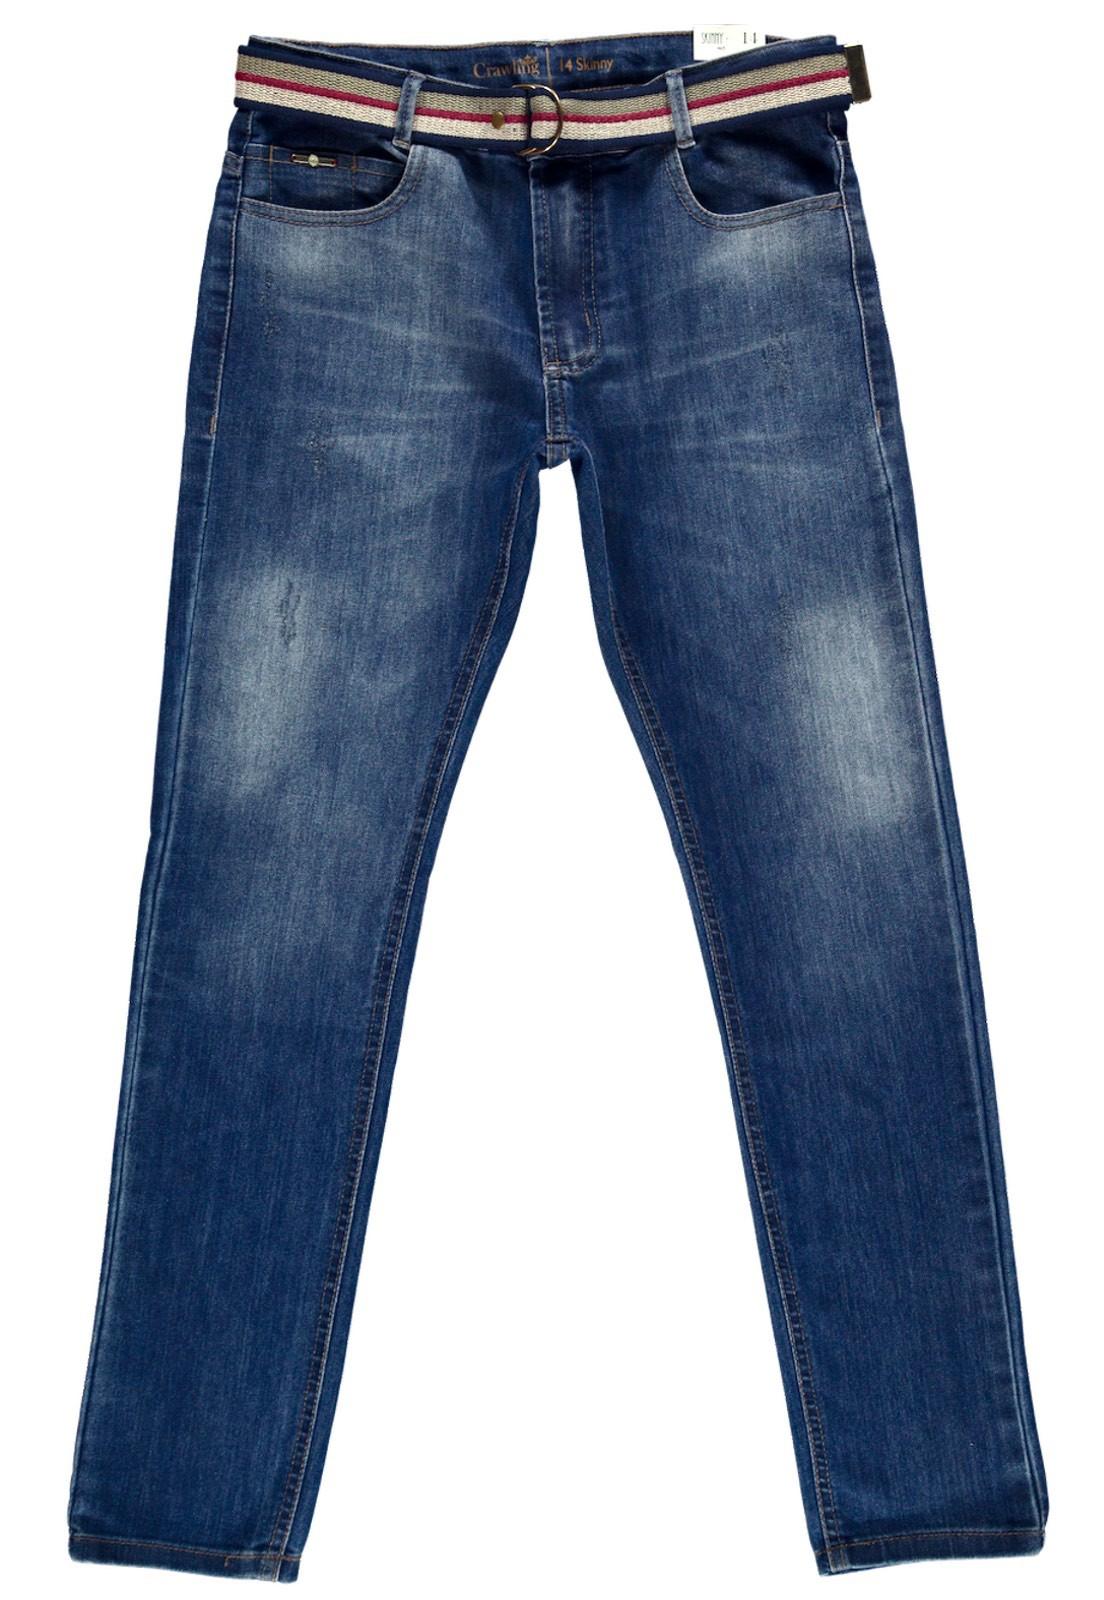 Calça C/Cinto Crawling Masculina Skinny Jeans